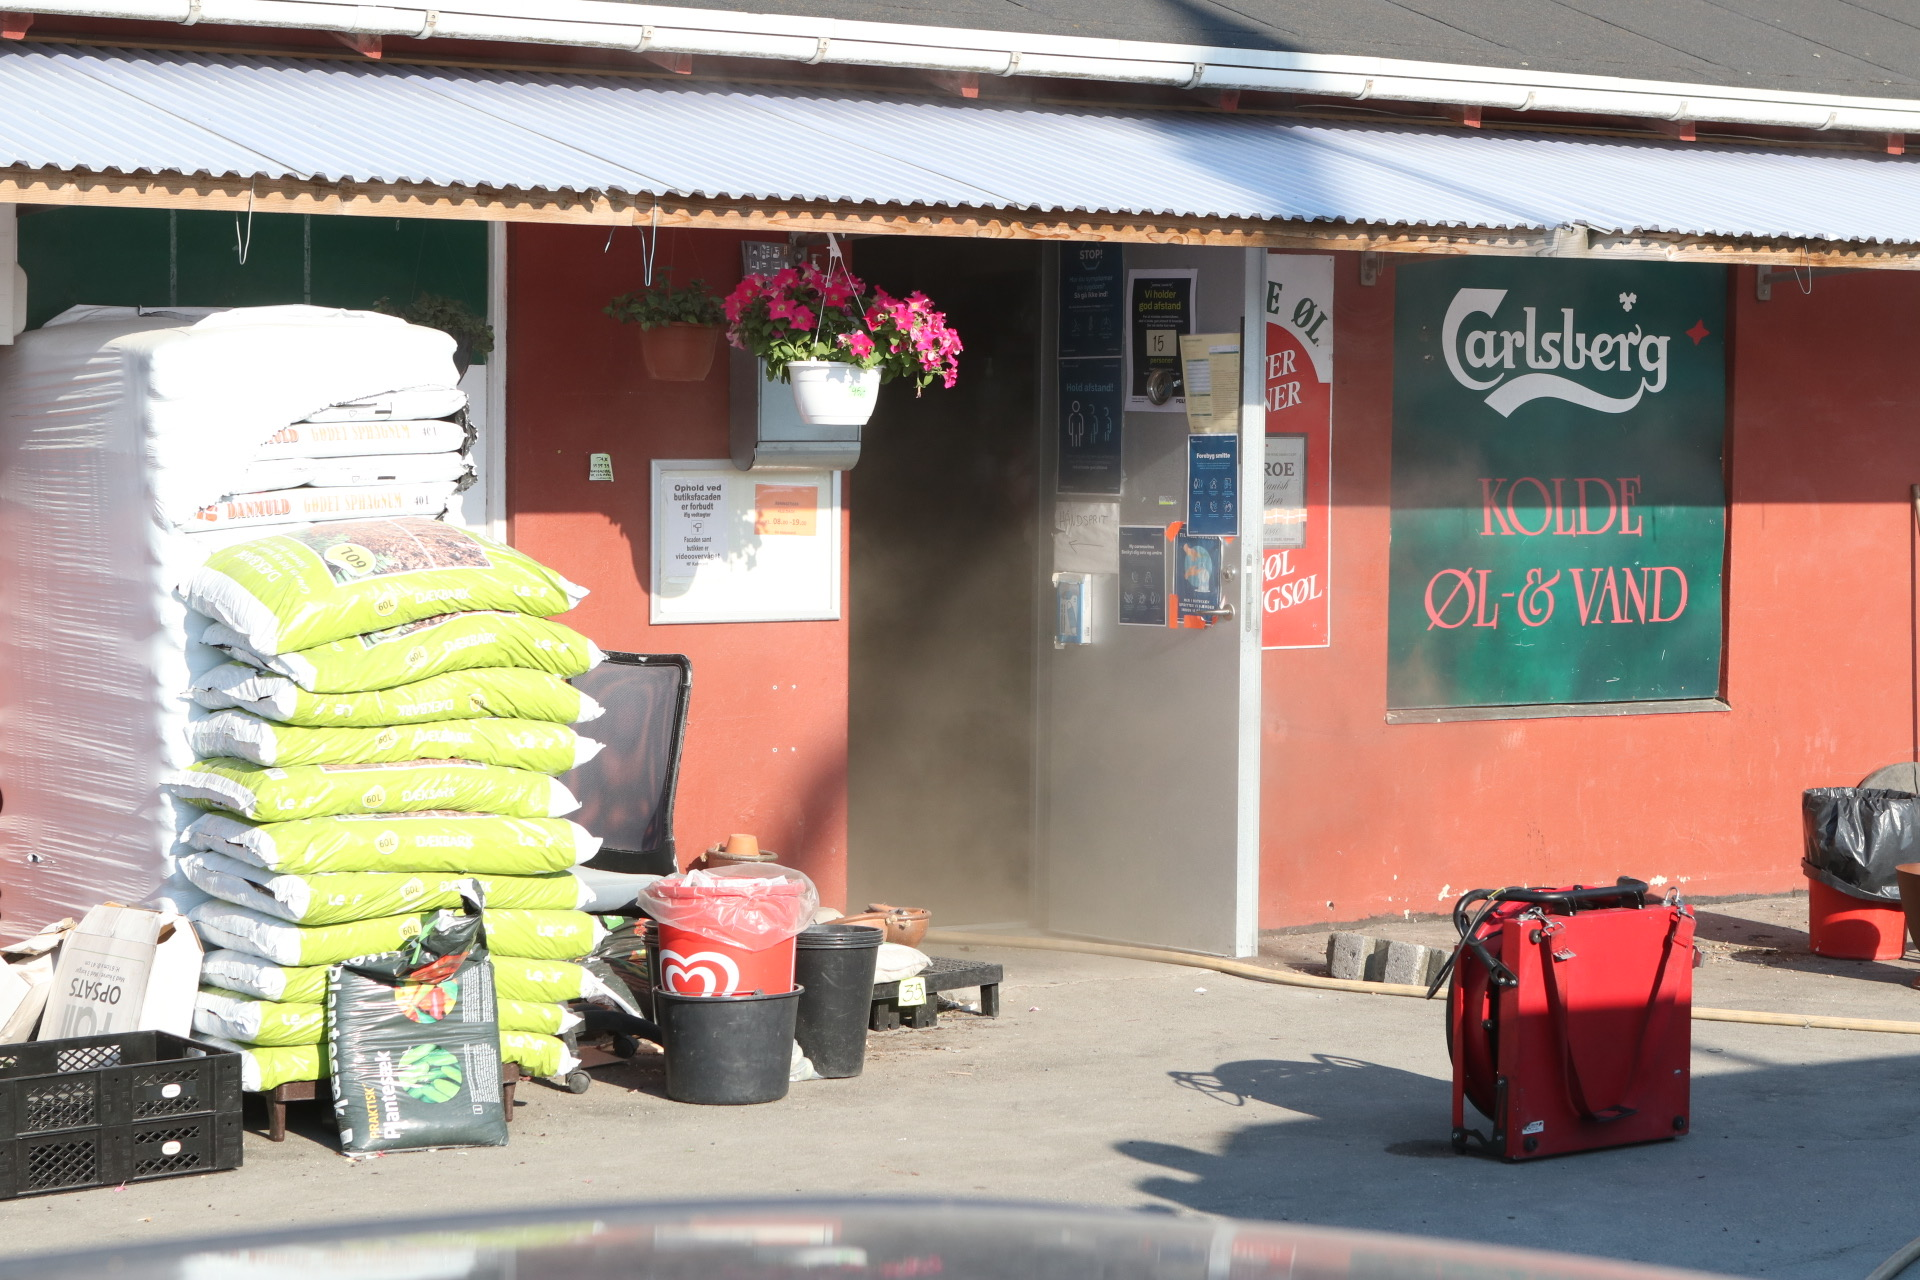 Brand i kolonihave købmand i Herlev